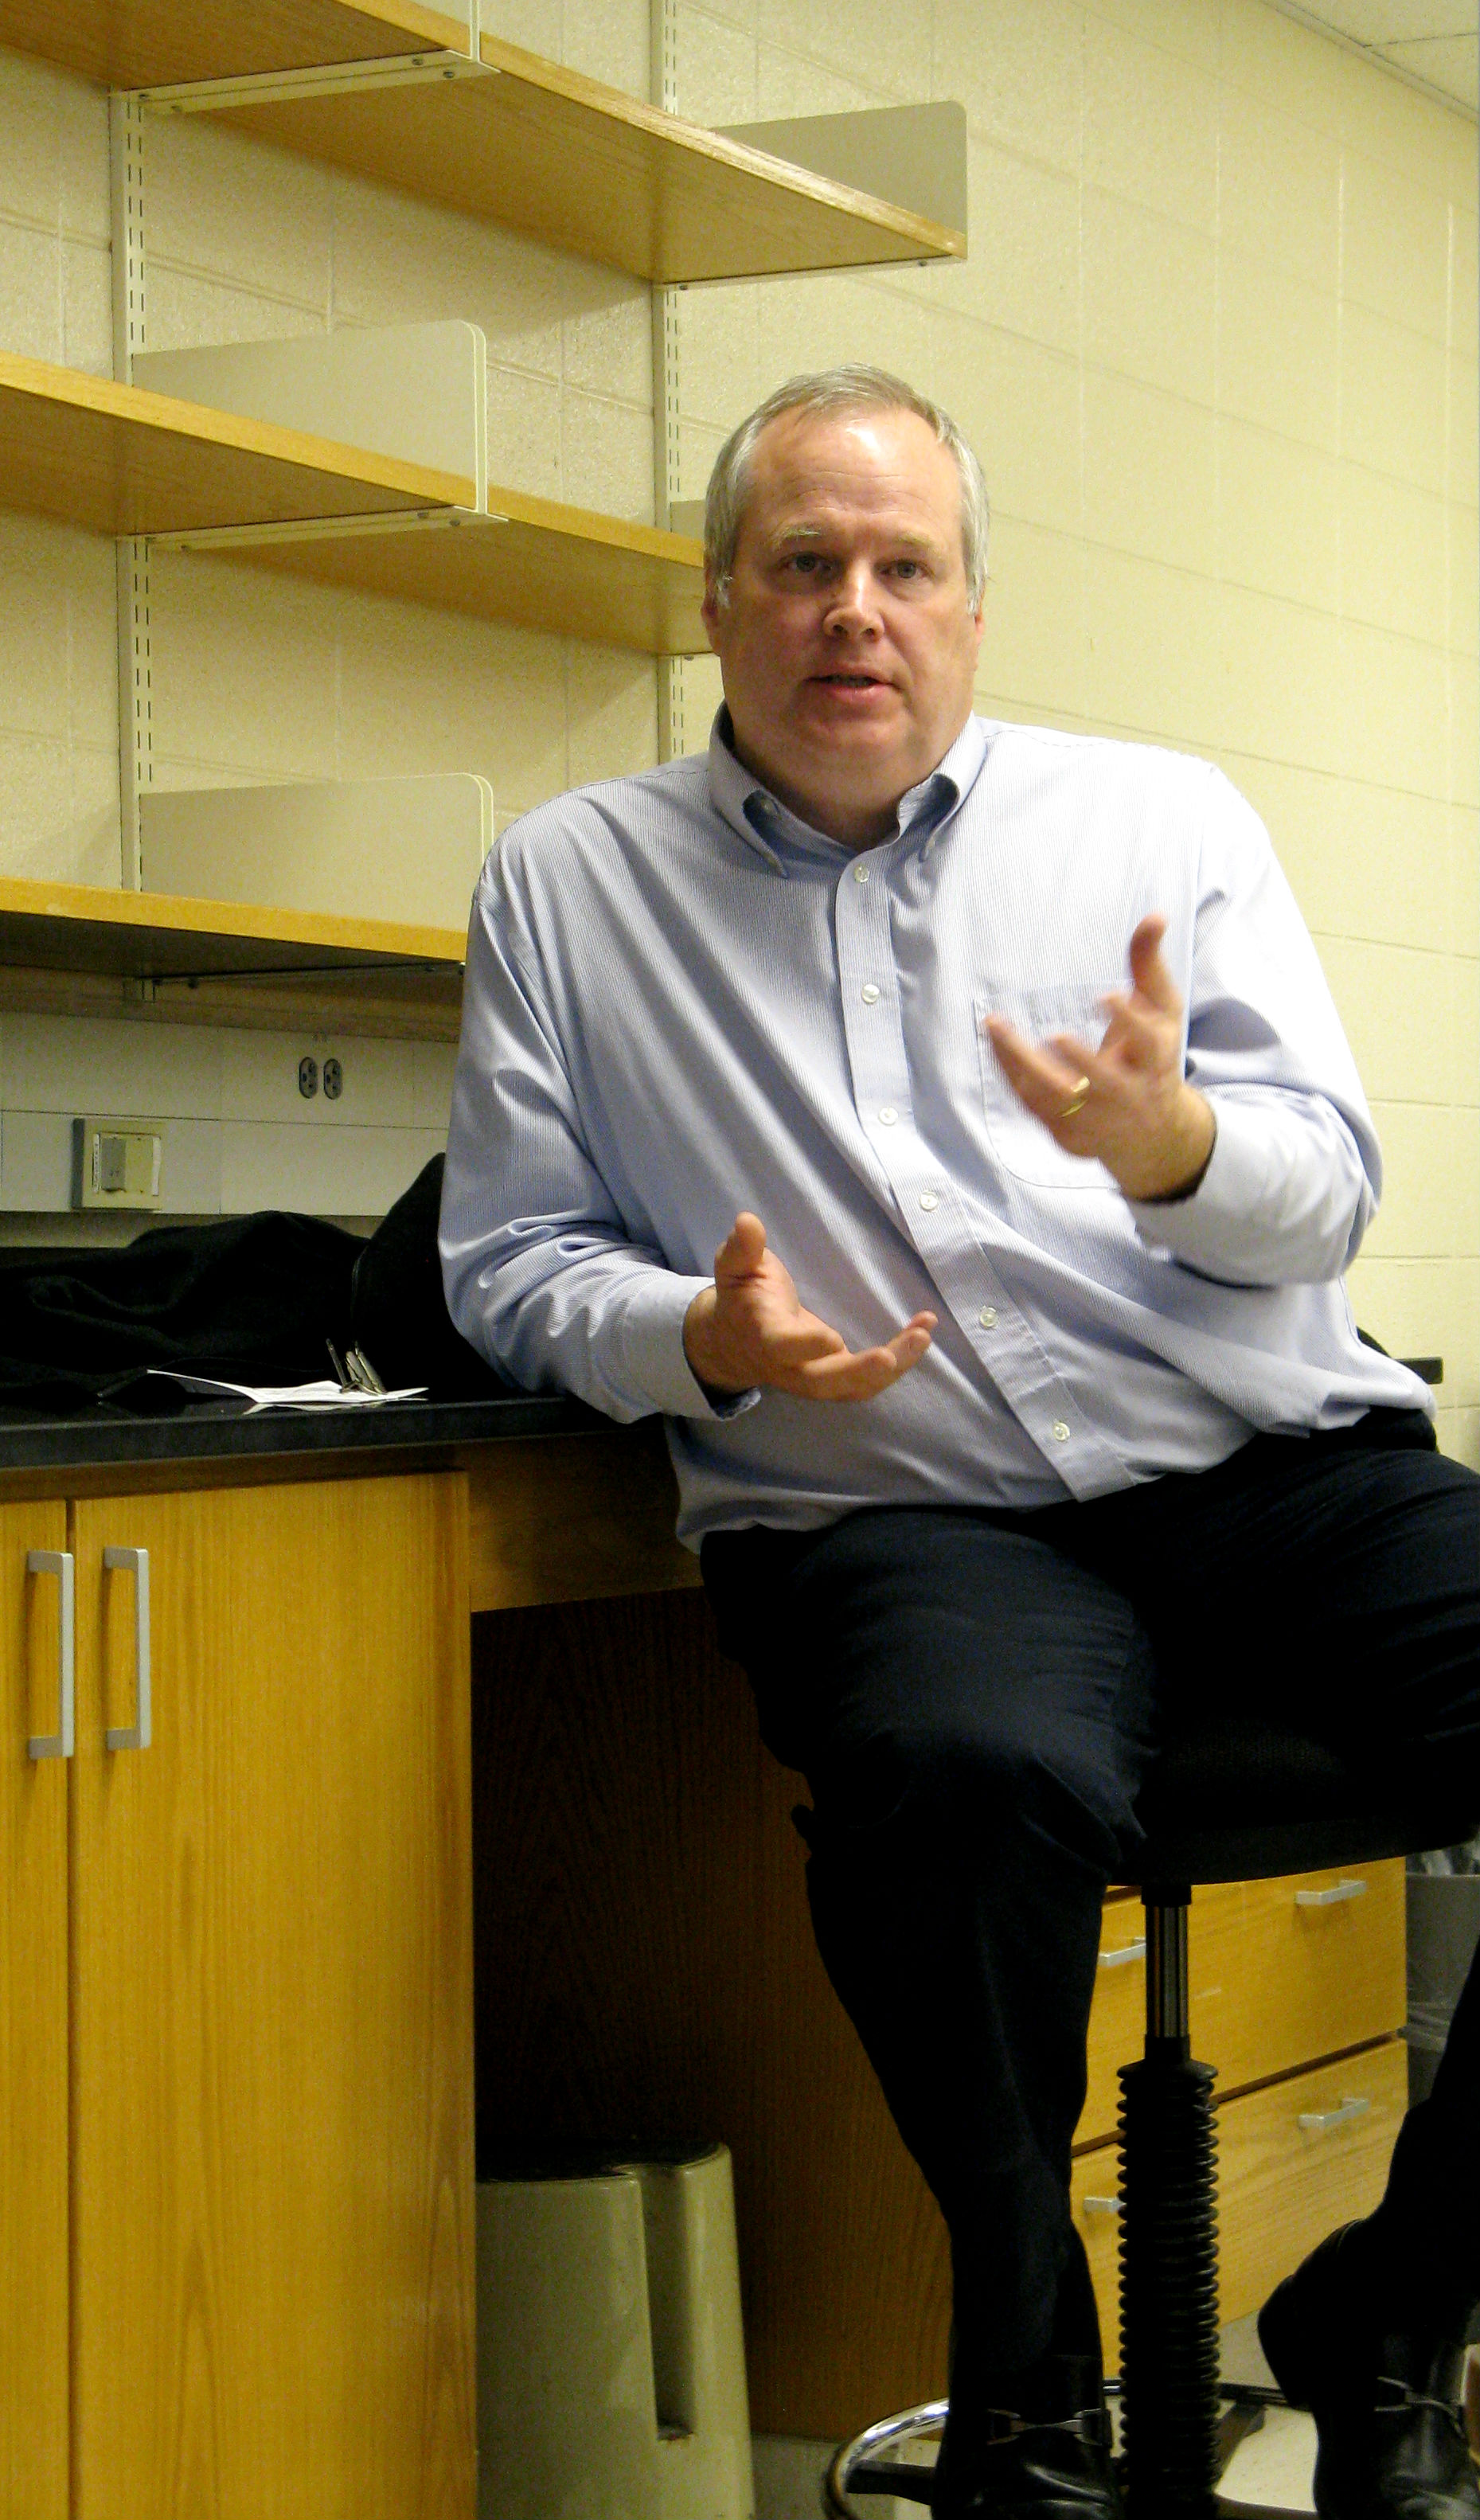 PhD Chris McGrew